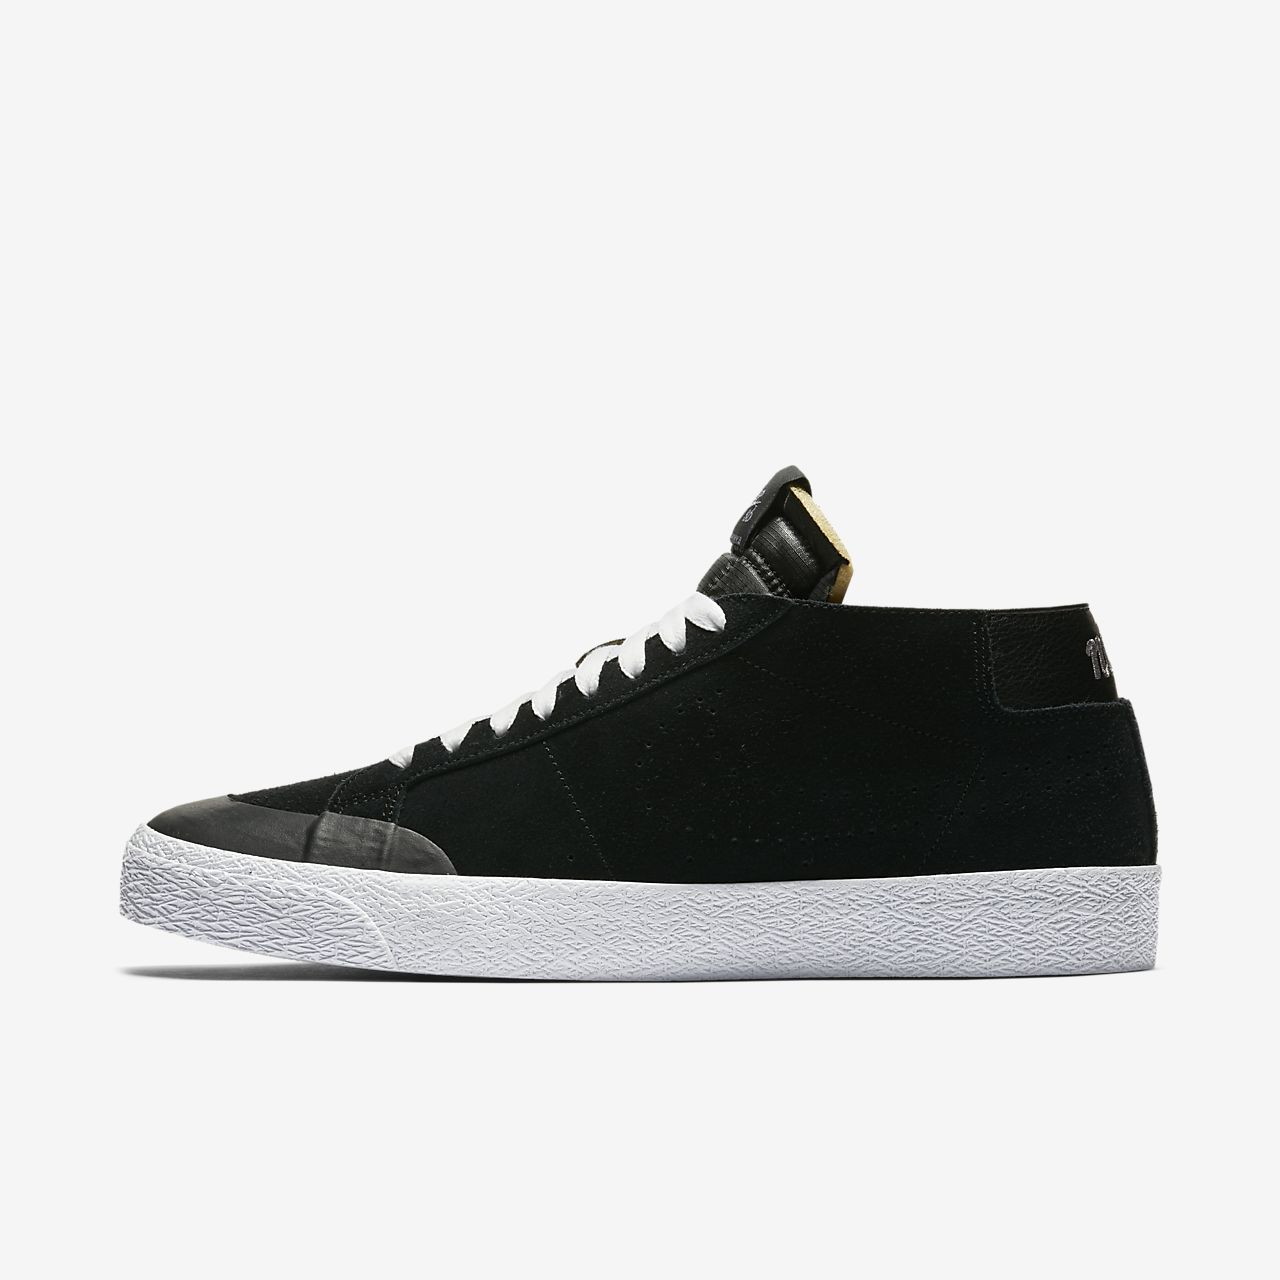 Skateboardsko Nike SB Zoom Blazer Chukka XT för män